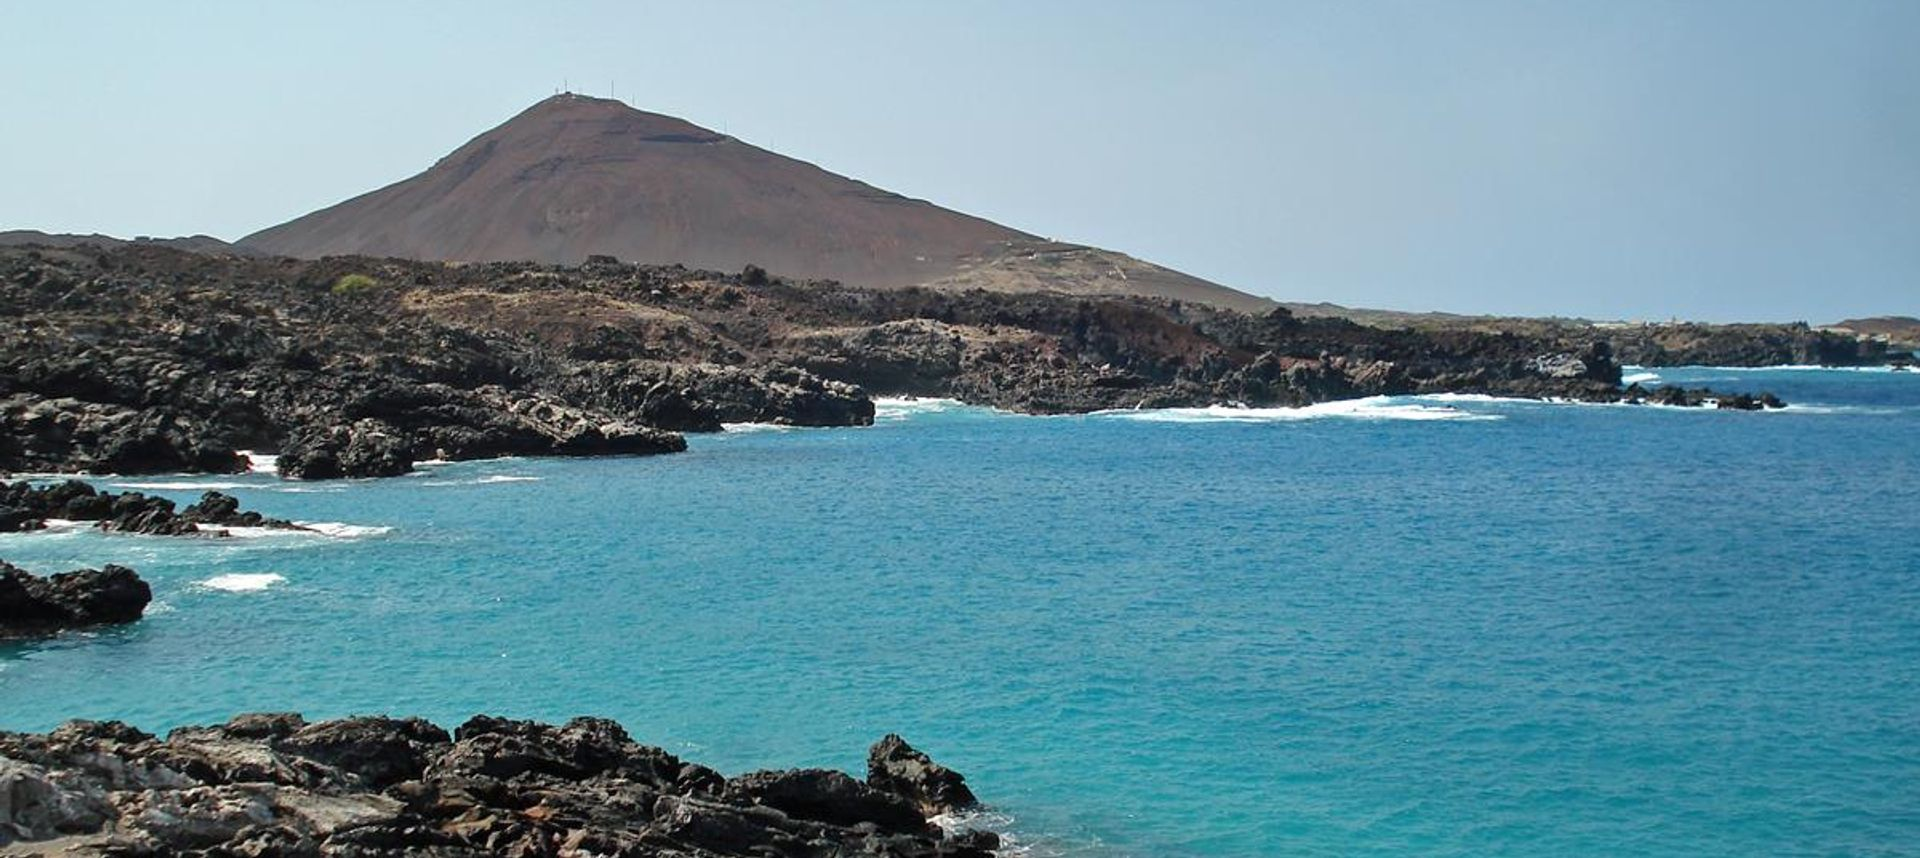 Alien landscape, Ascension Island. (Wendy DS)